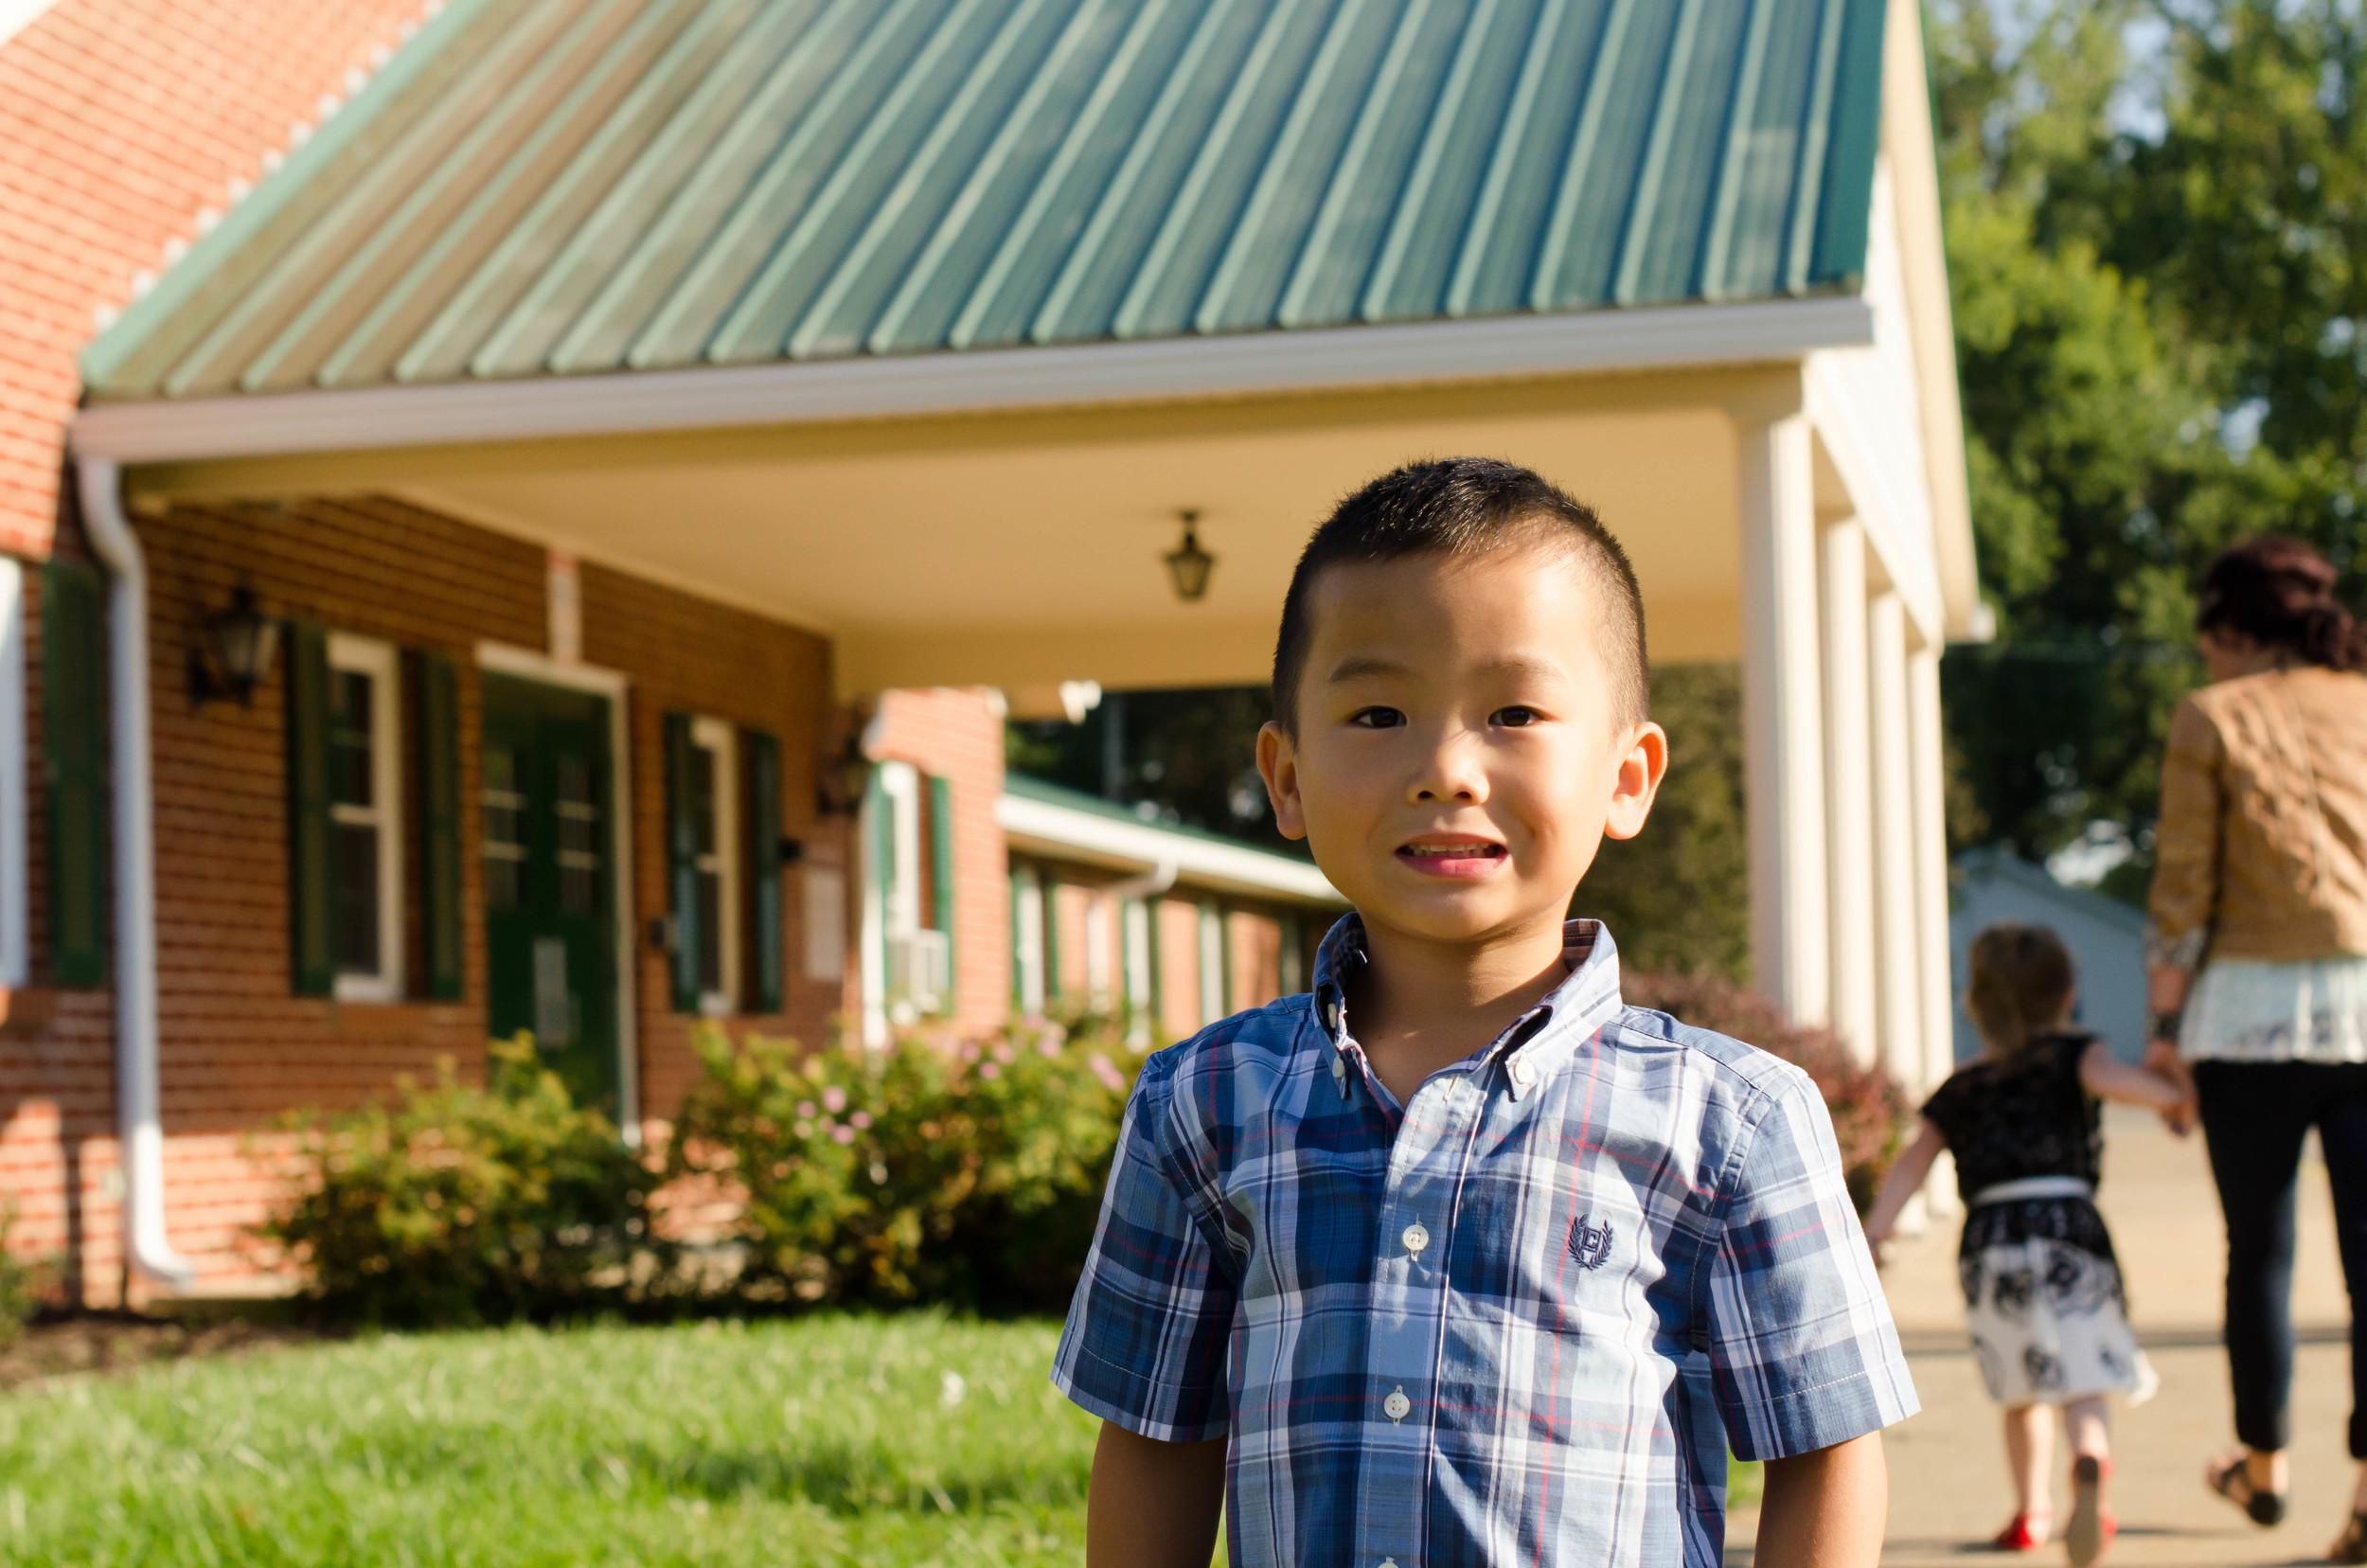 First Day of Preschool at North Terrace Christian Preschool